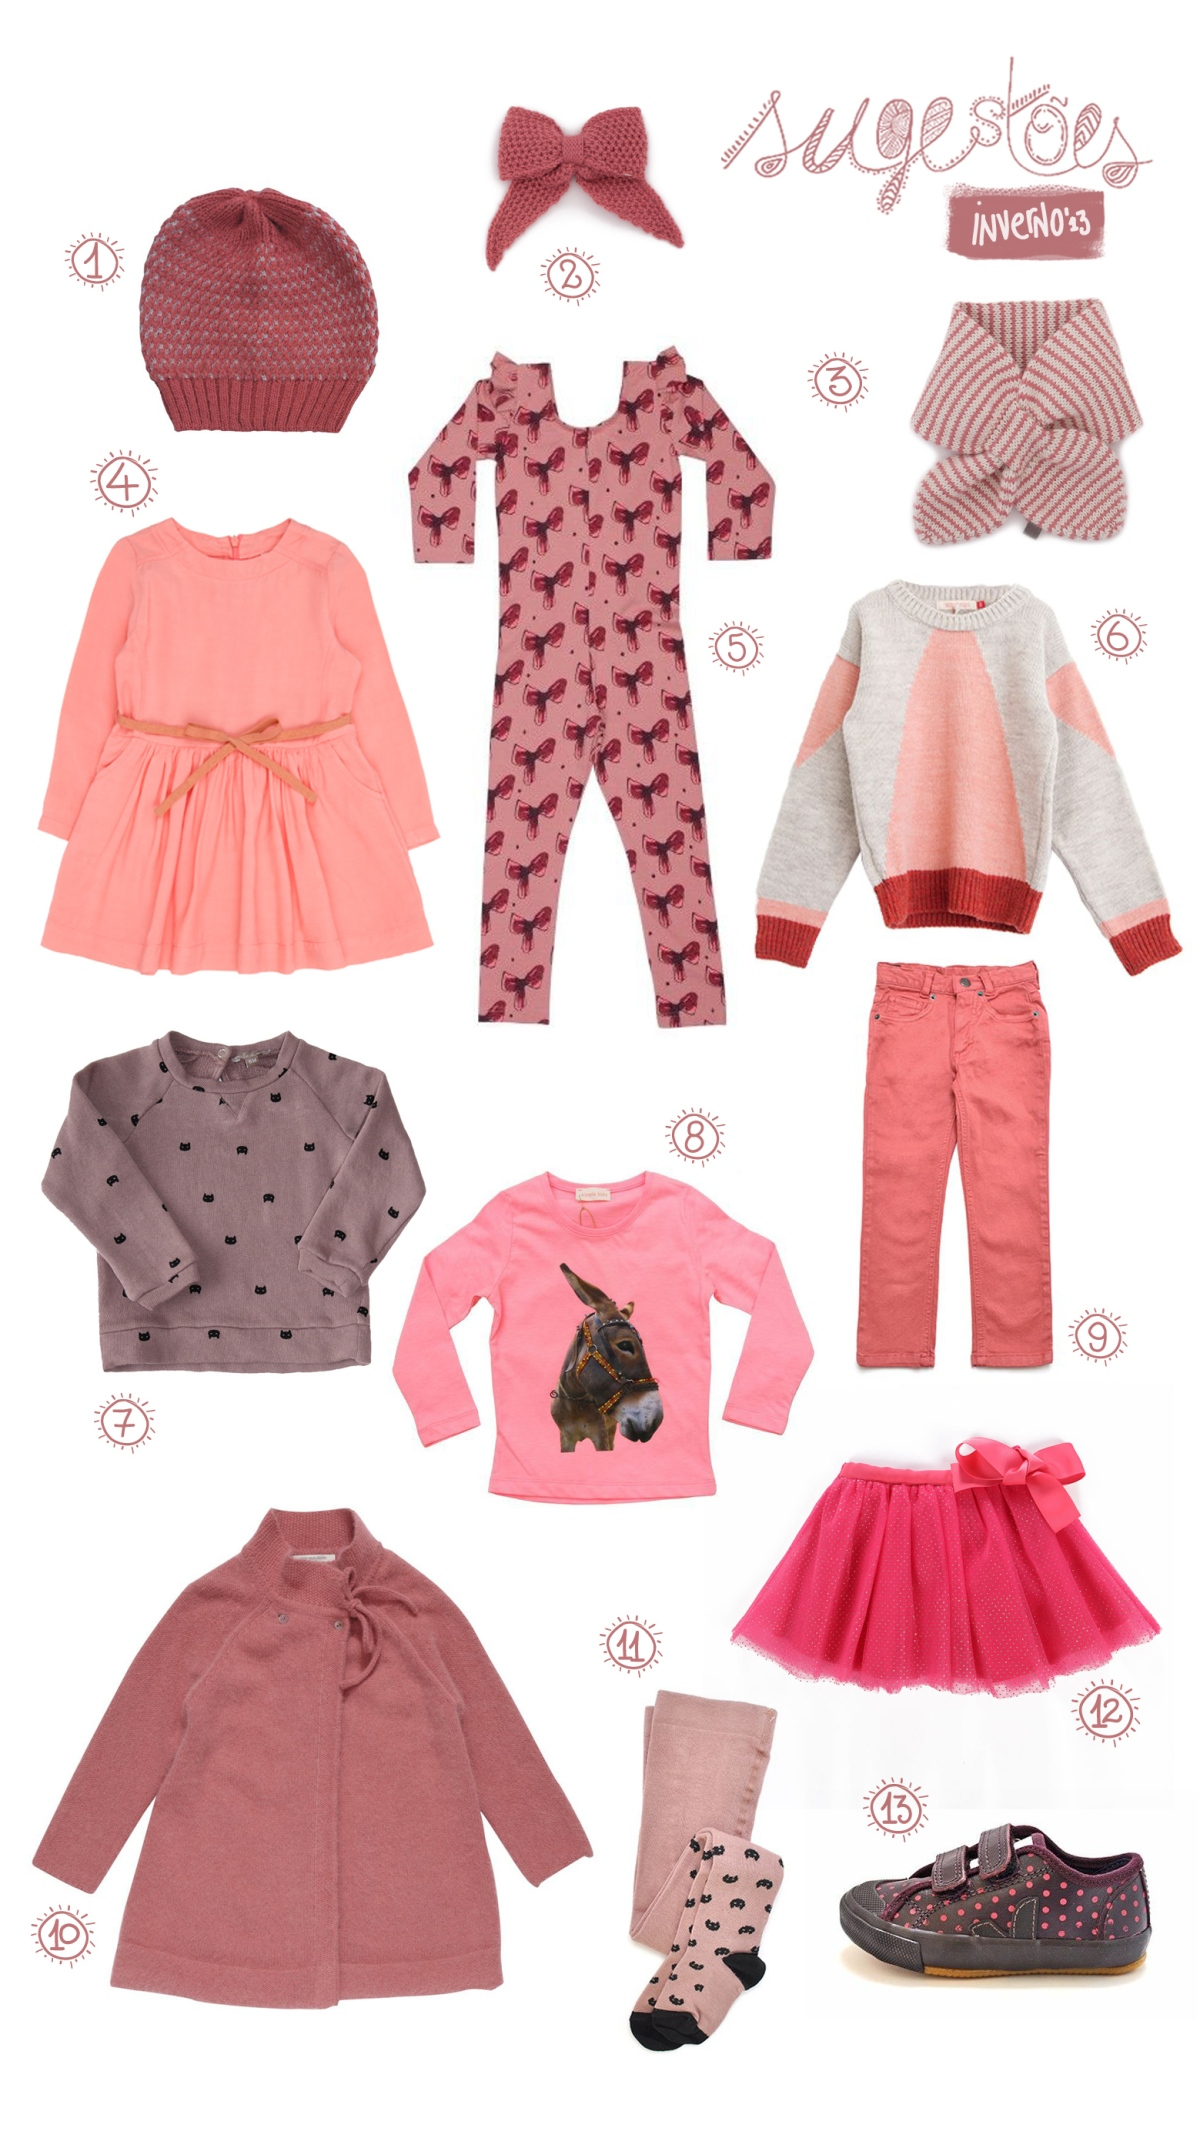 rebuçado ácido - rosa (pink)